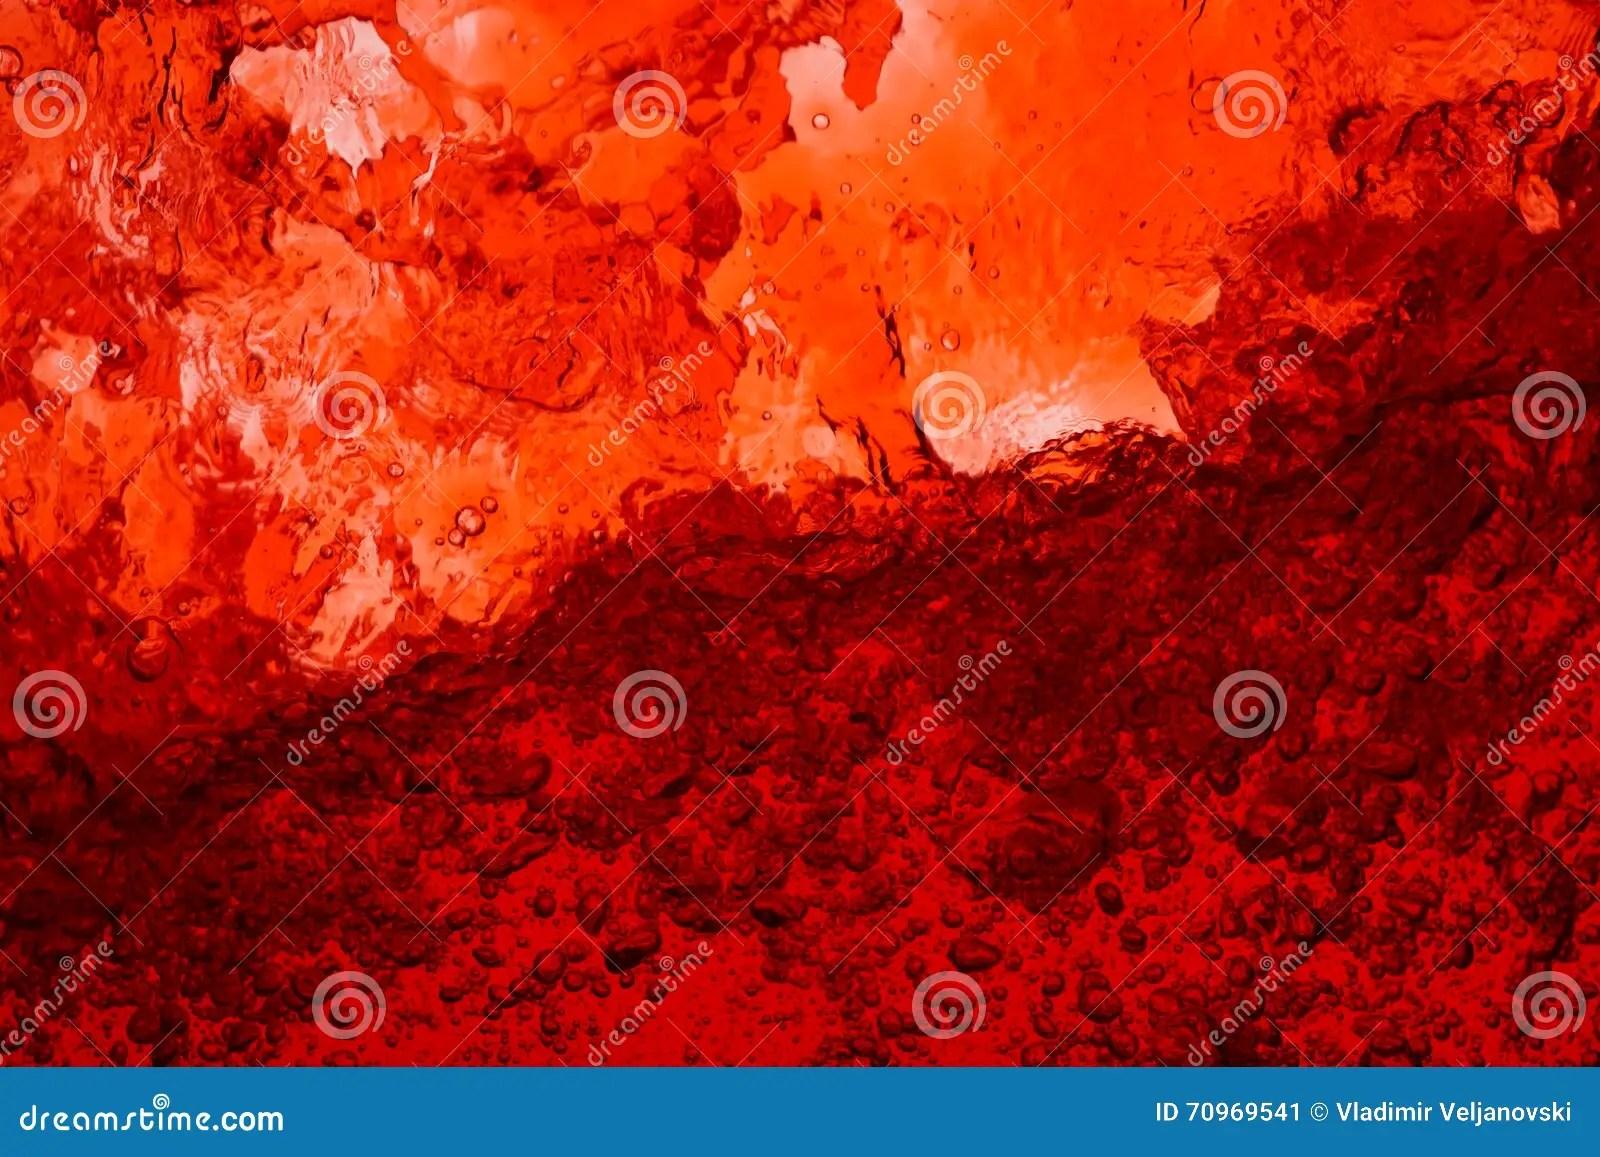 Download Turbulent Flows Wallpaper Images Free Zaloro